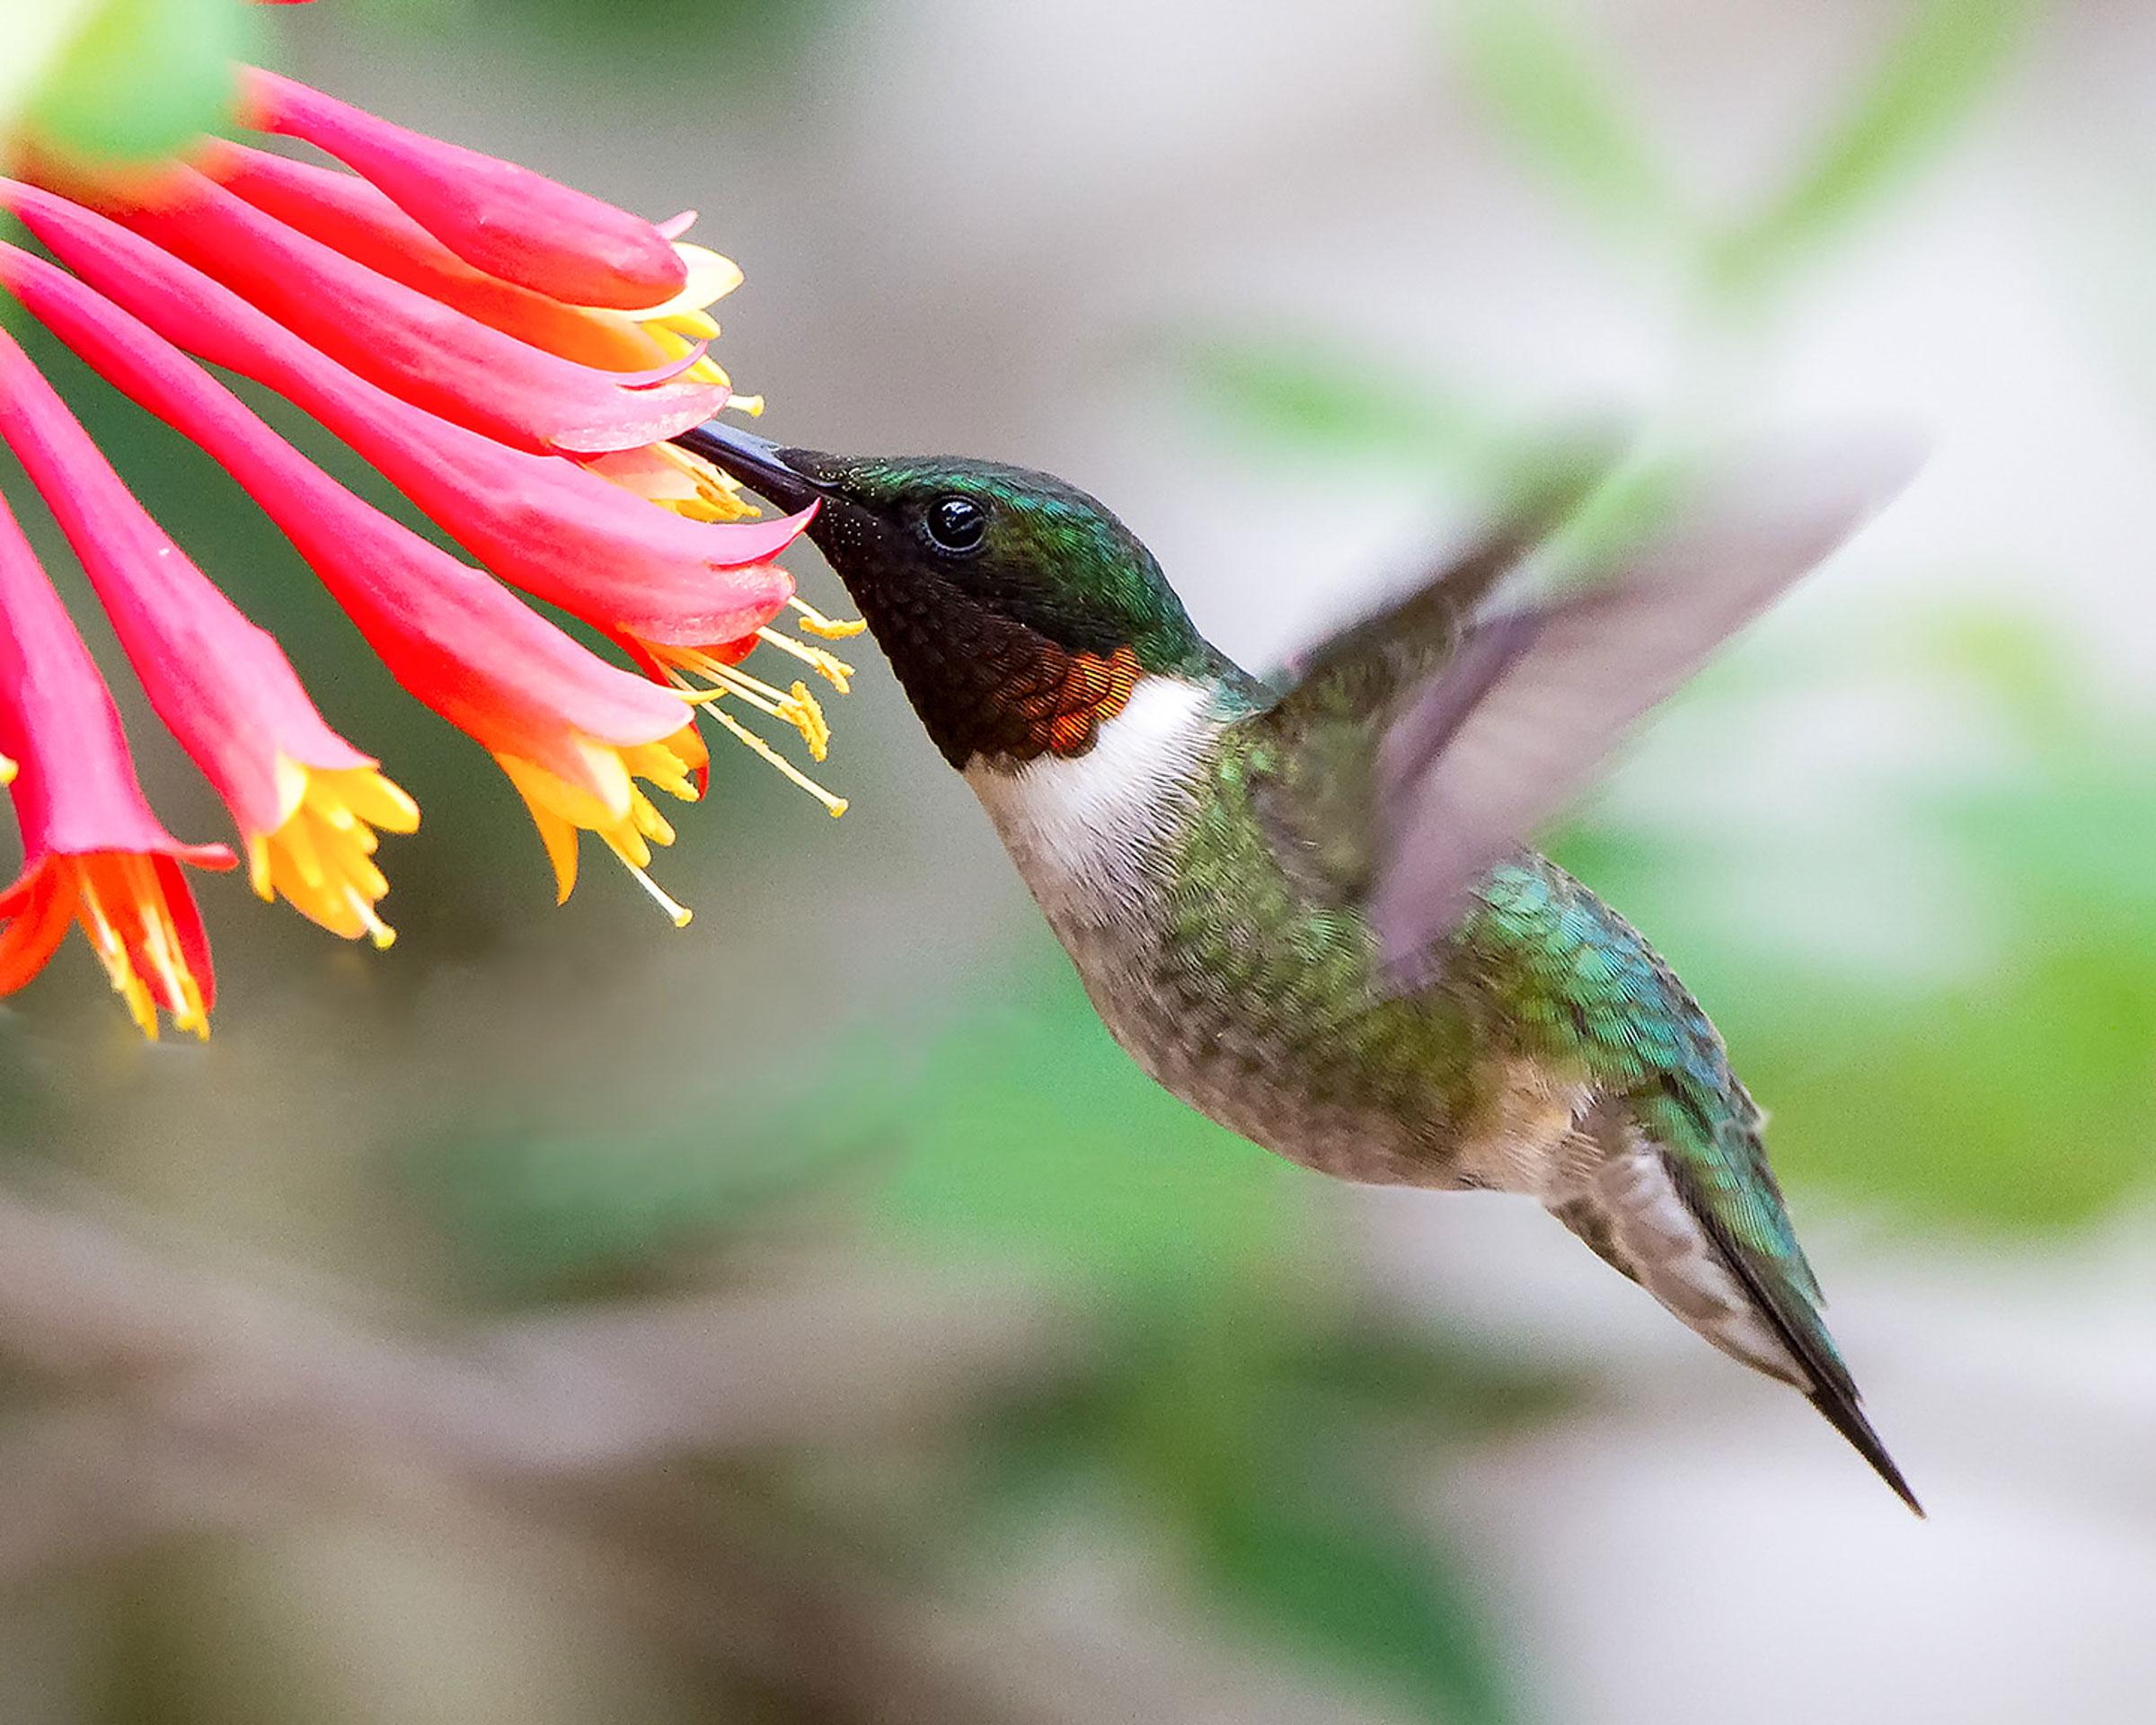 web_apa_2015_davidshipper_ruby-throated_hummingbird_kk.jpg